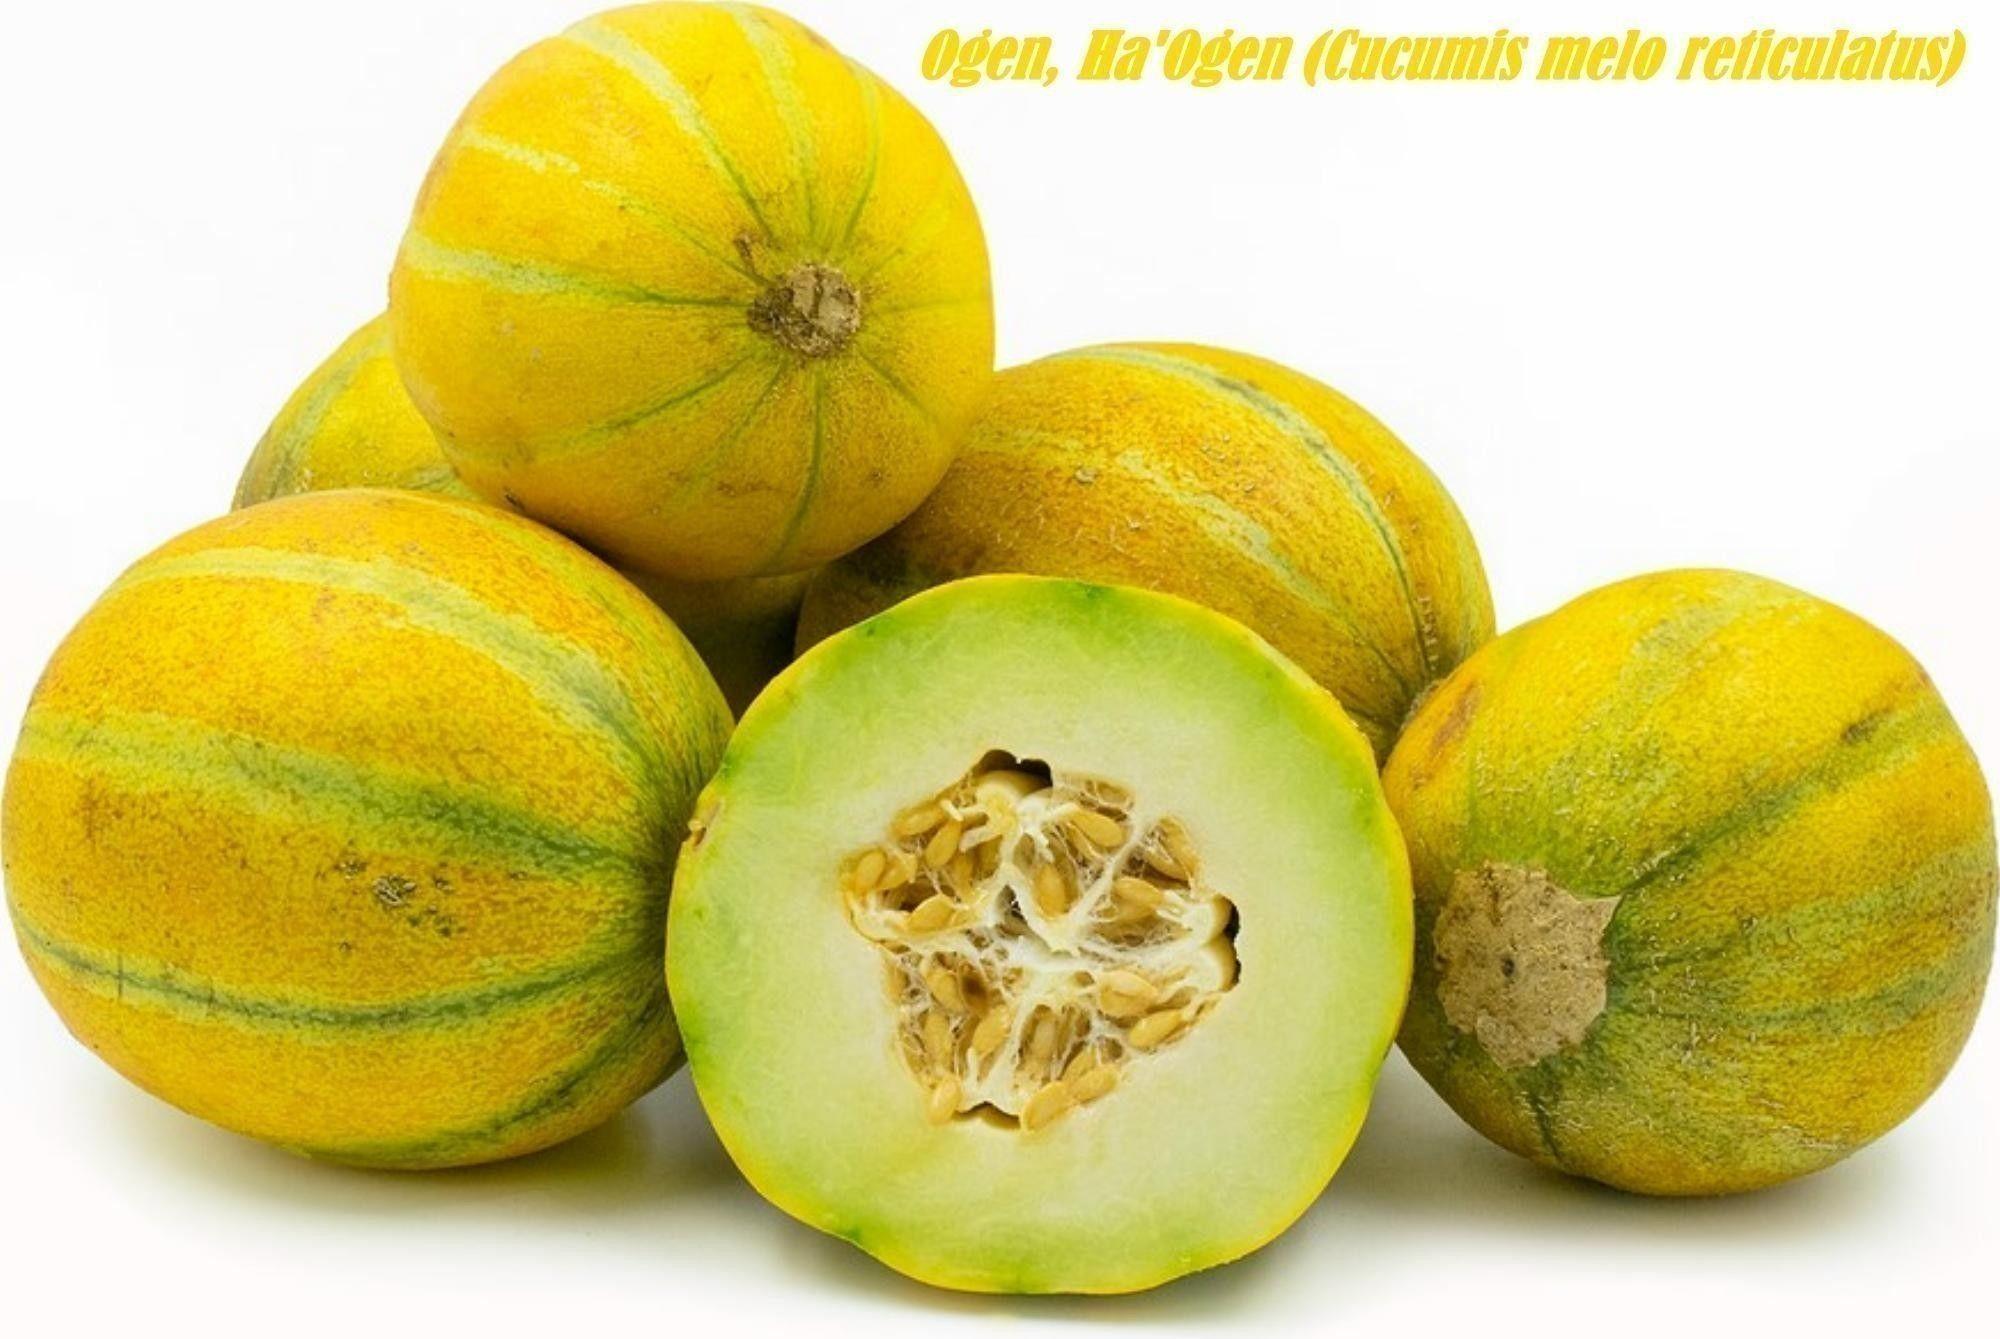 Ogen Ha Ogen Desert Melon Seeds Cucumis Melo Reticulatus Seeds Season Fruits And Vegetables Tomato Seeds